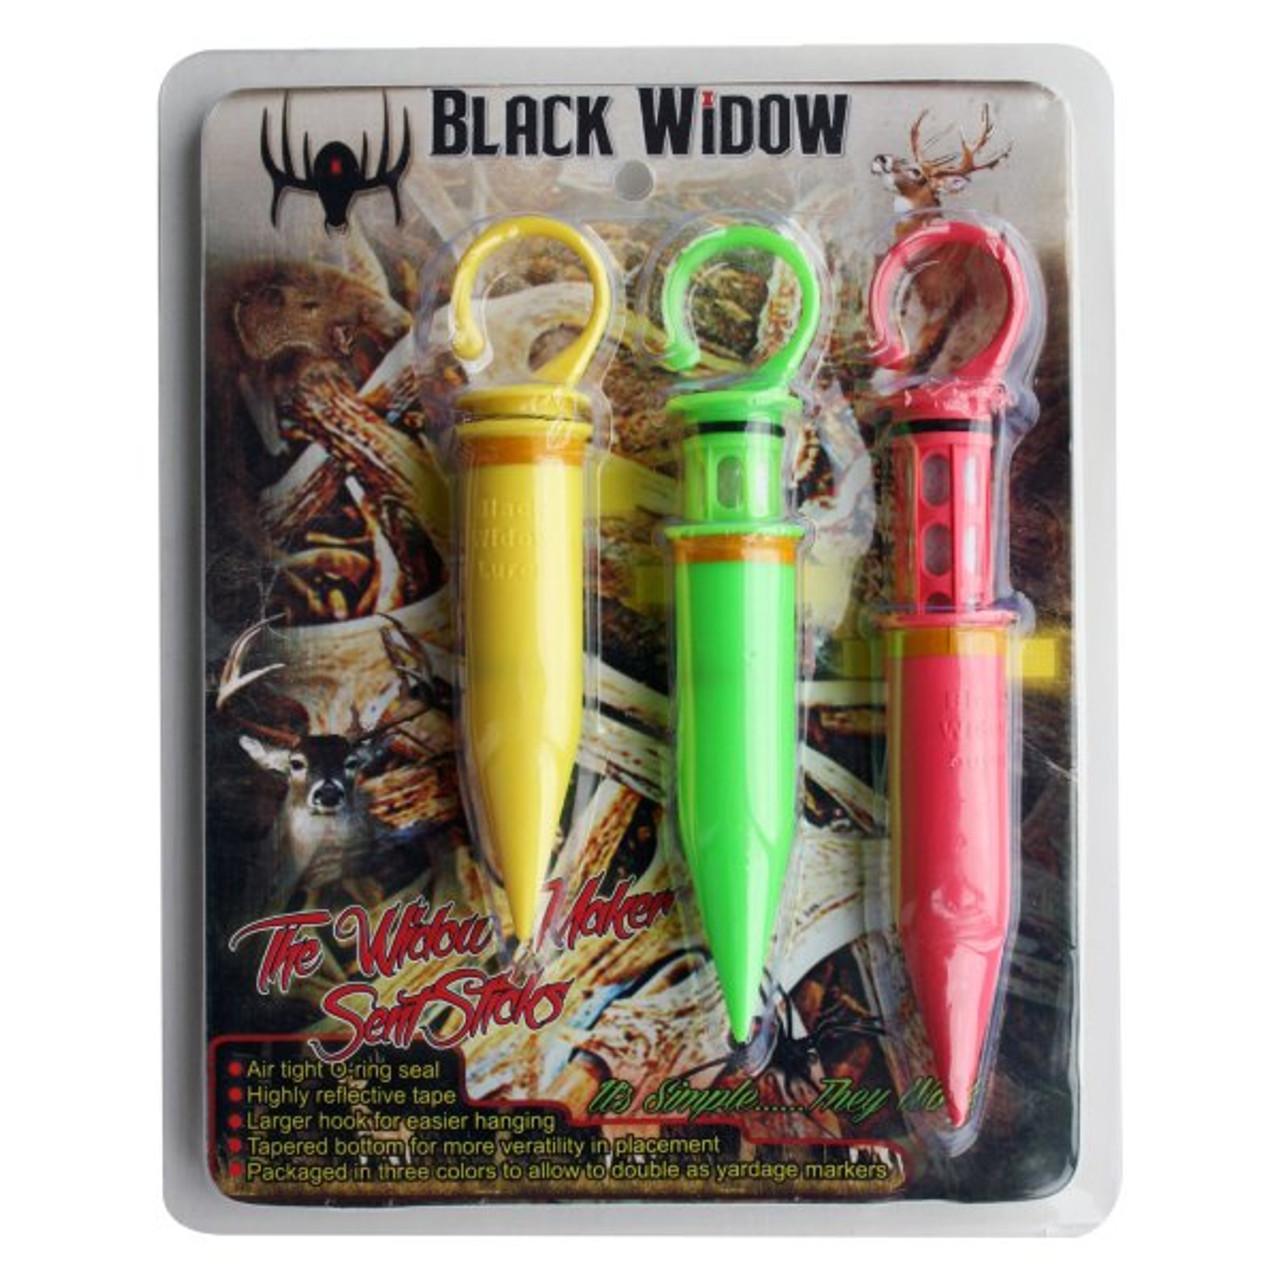 Black Widow Maker Scent Sticks 3 Pack